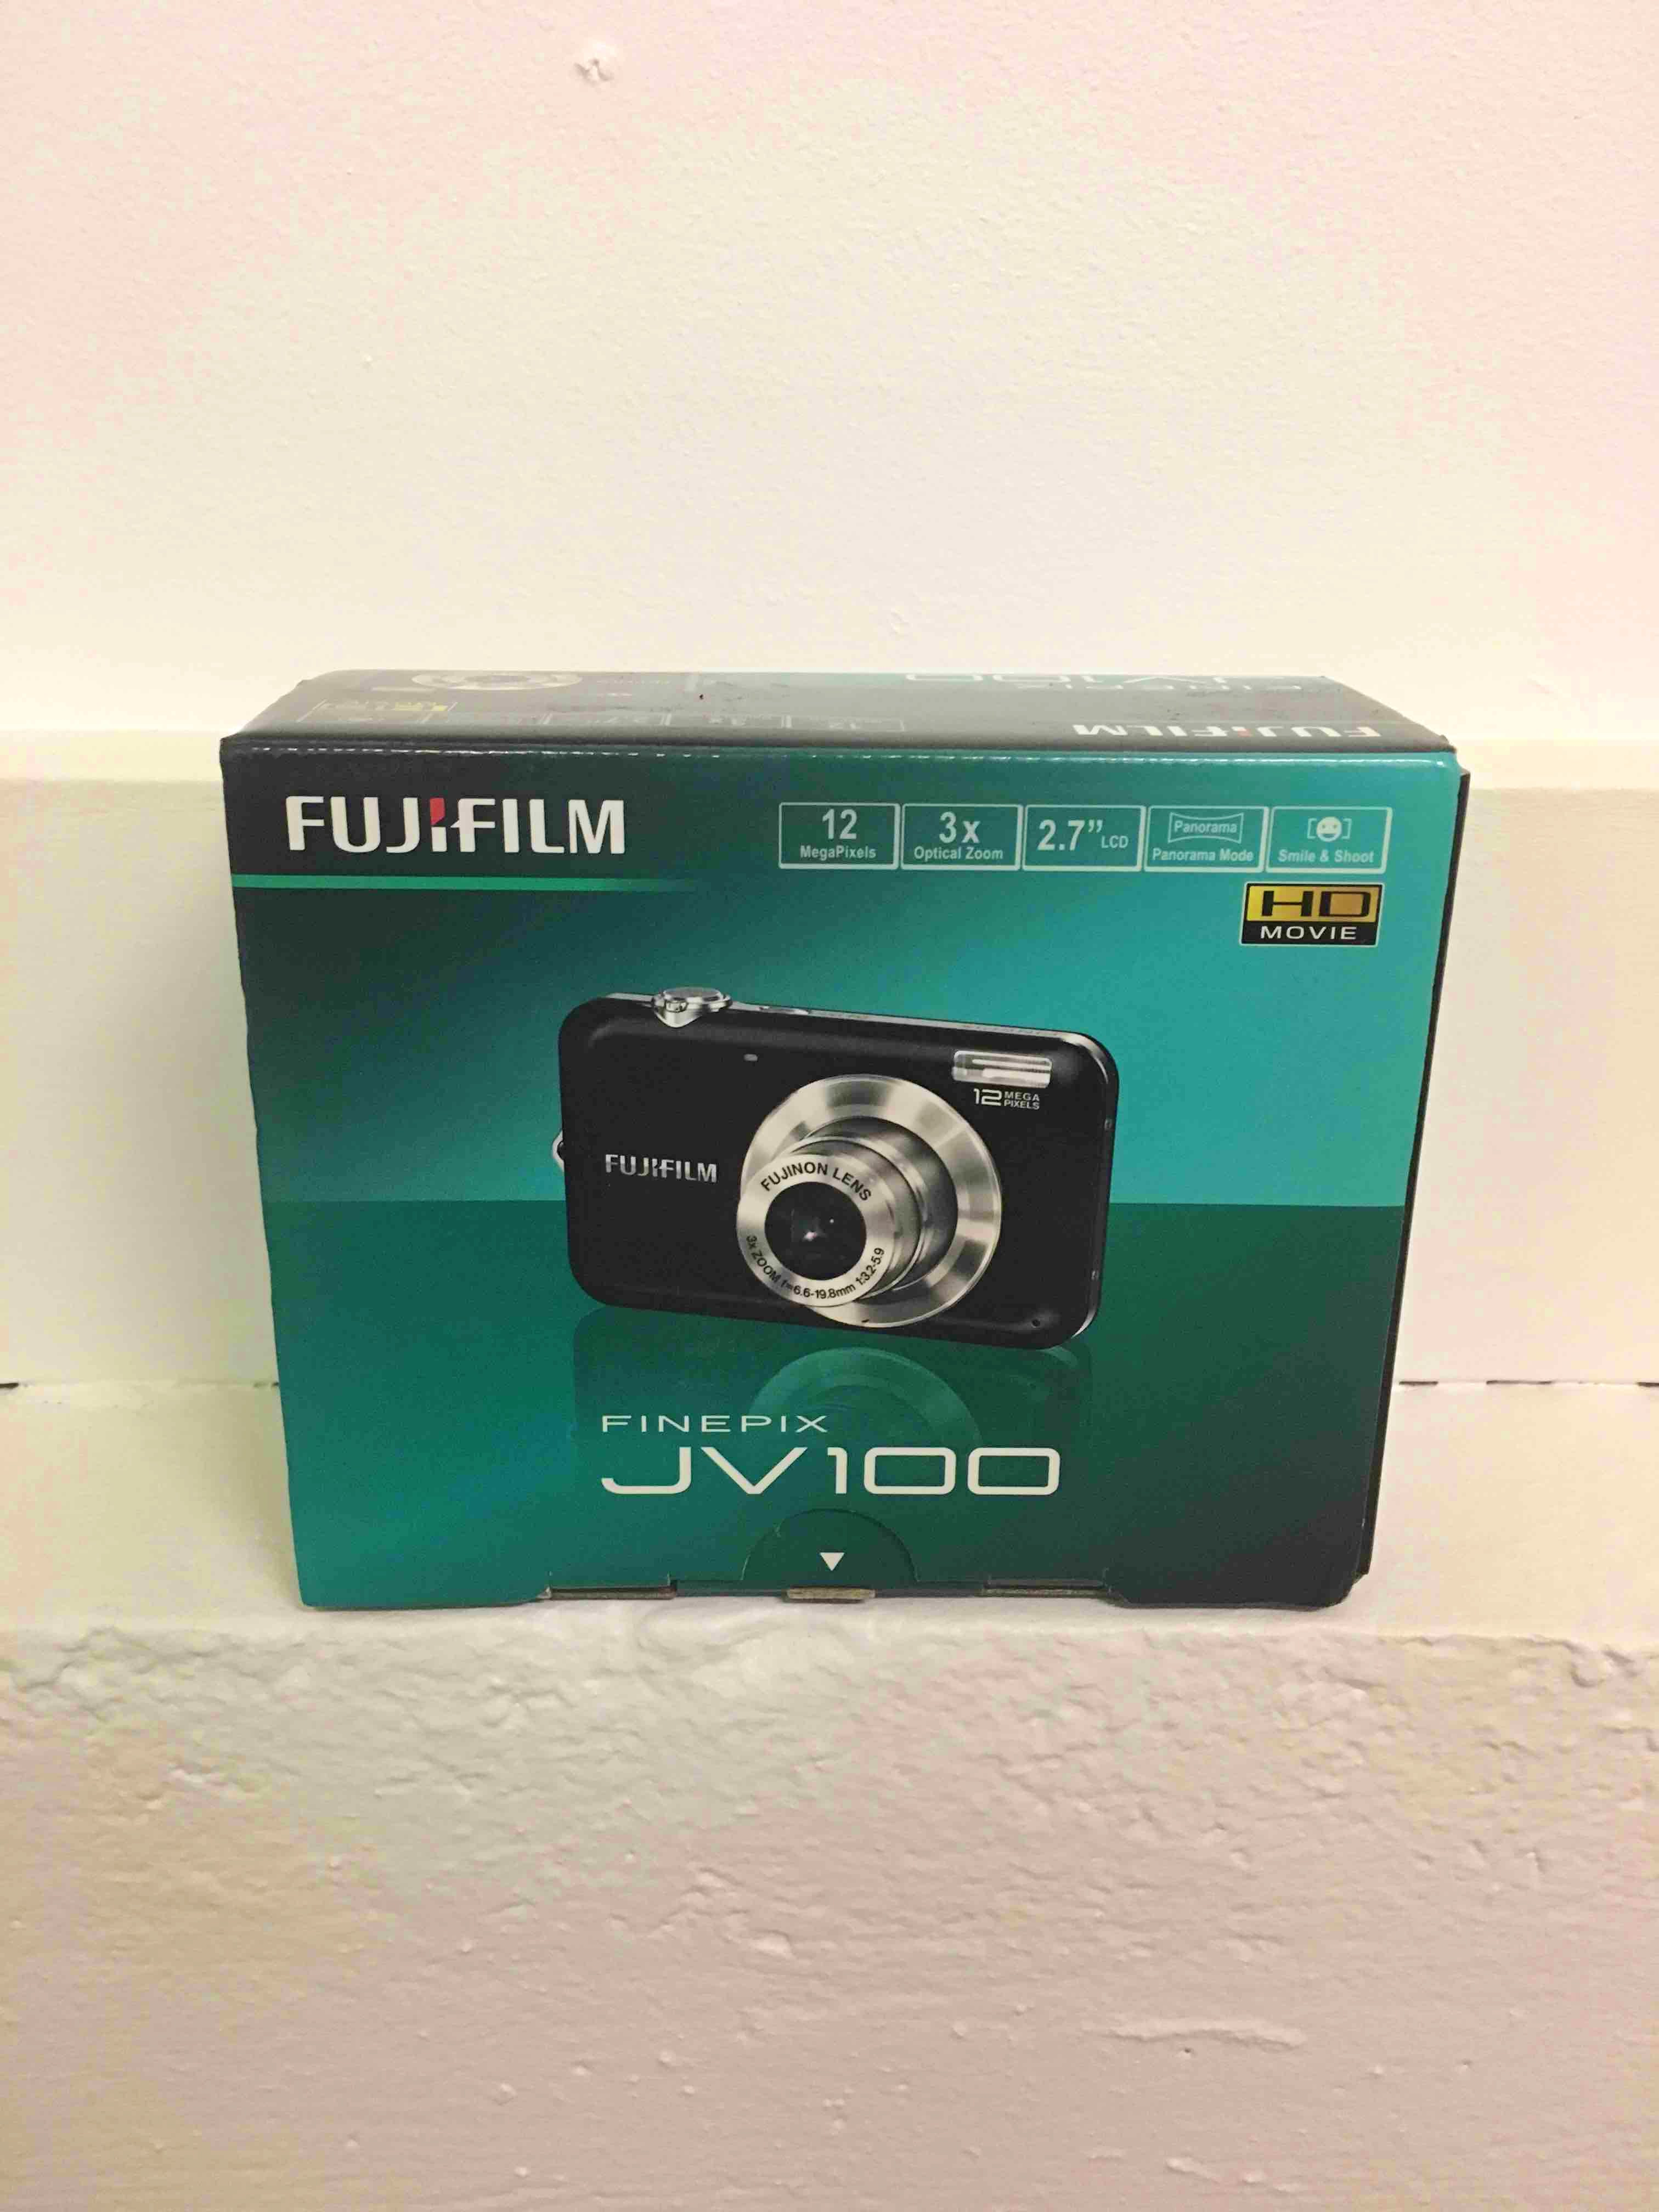 Fugifilm digital camera